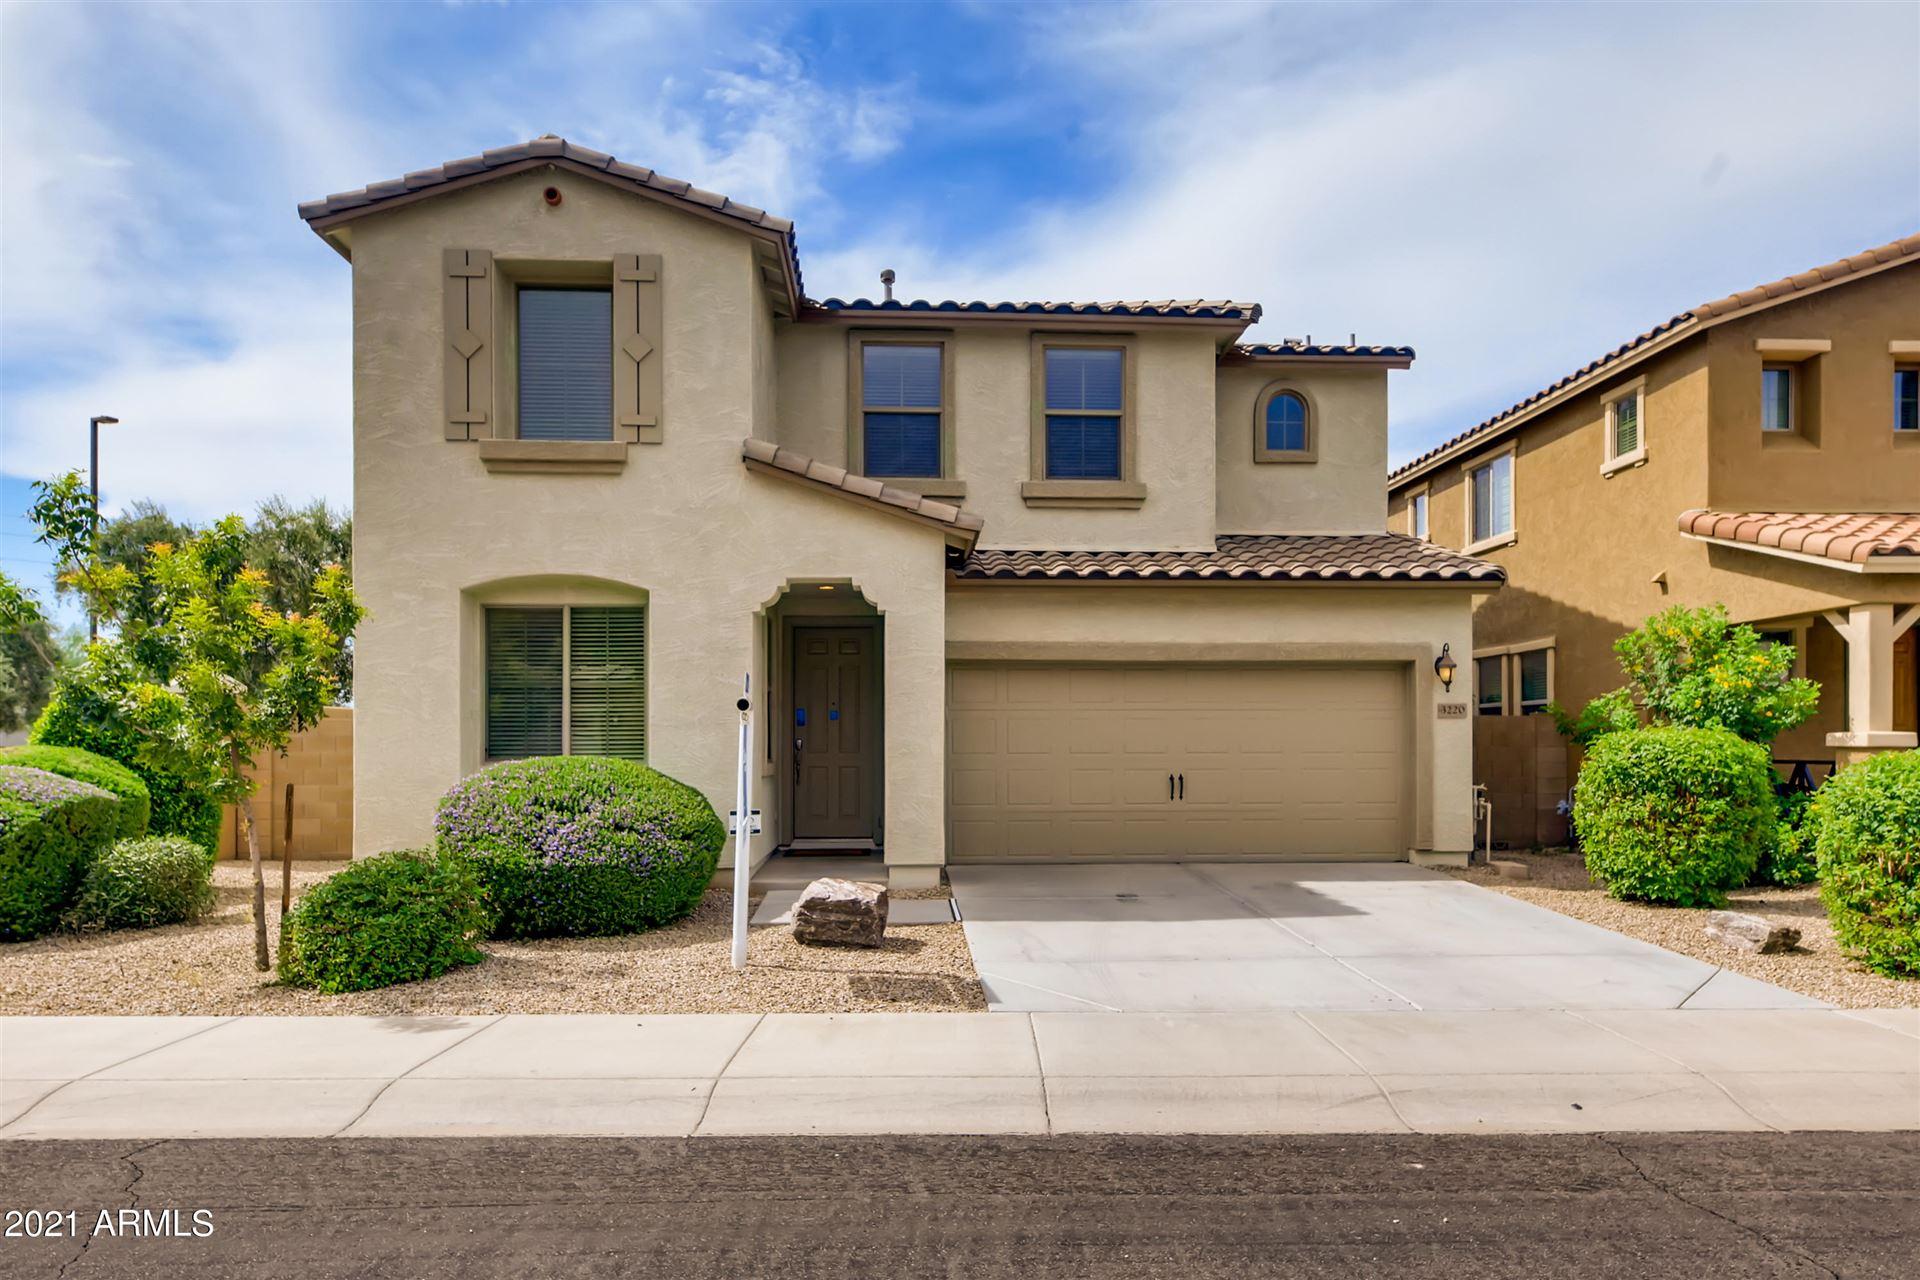 Photo of 3220 E SPORTS Drive, Gilbert, AZ 85298 (MLS # 6268981)